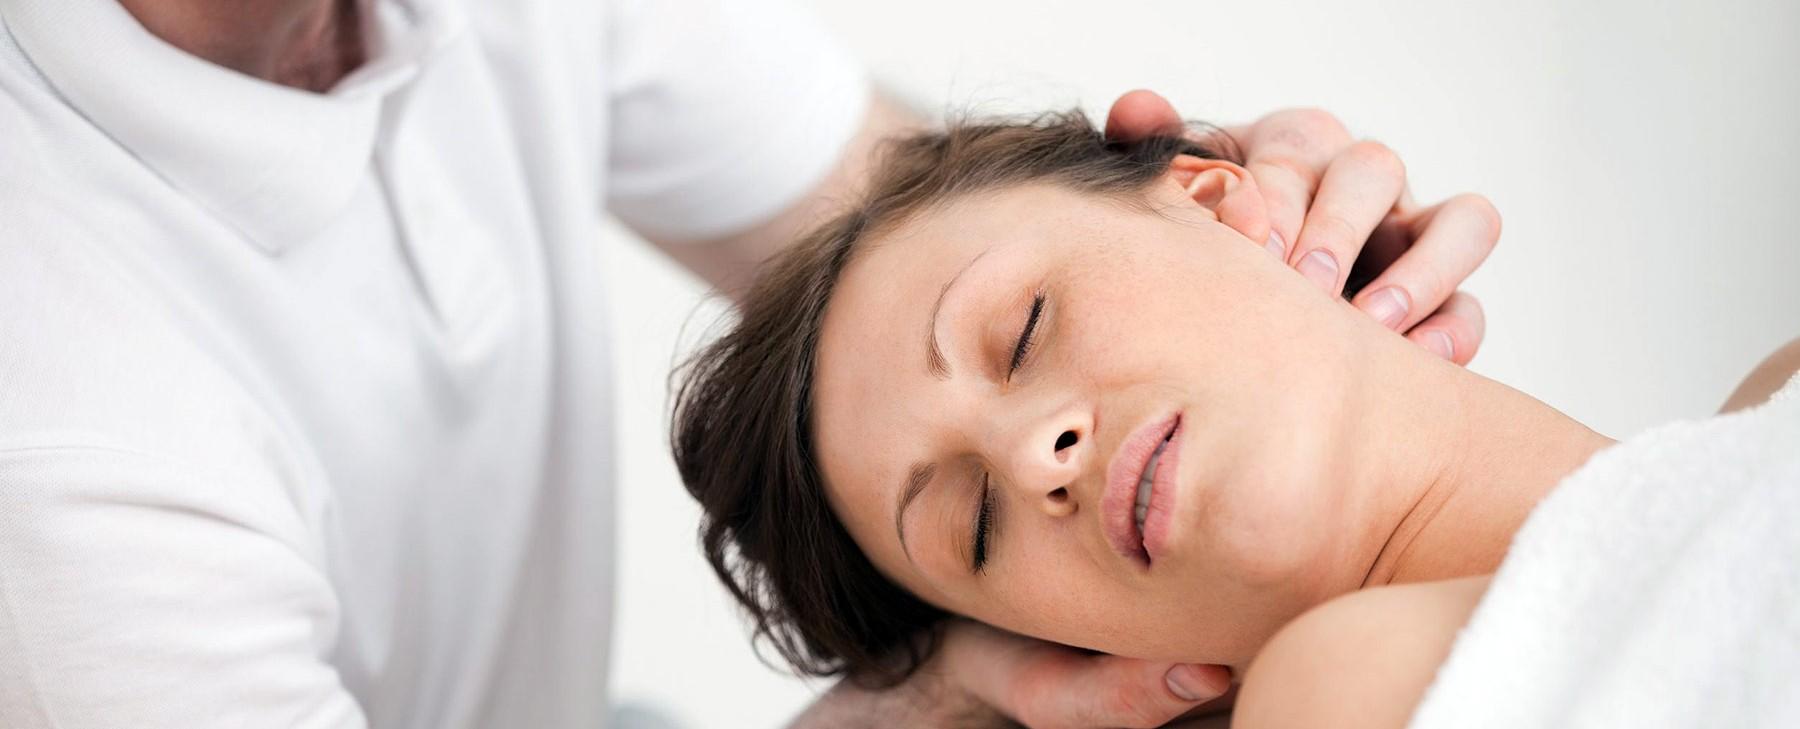 bodywork therapy cns kinetics